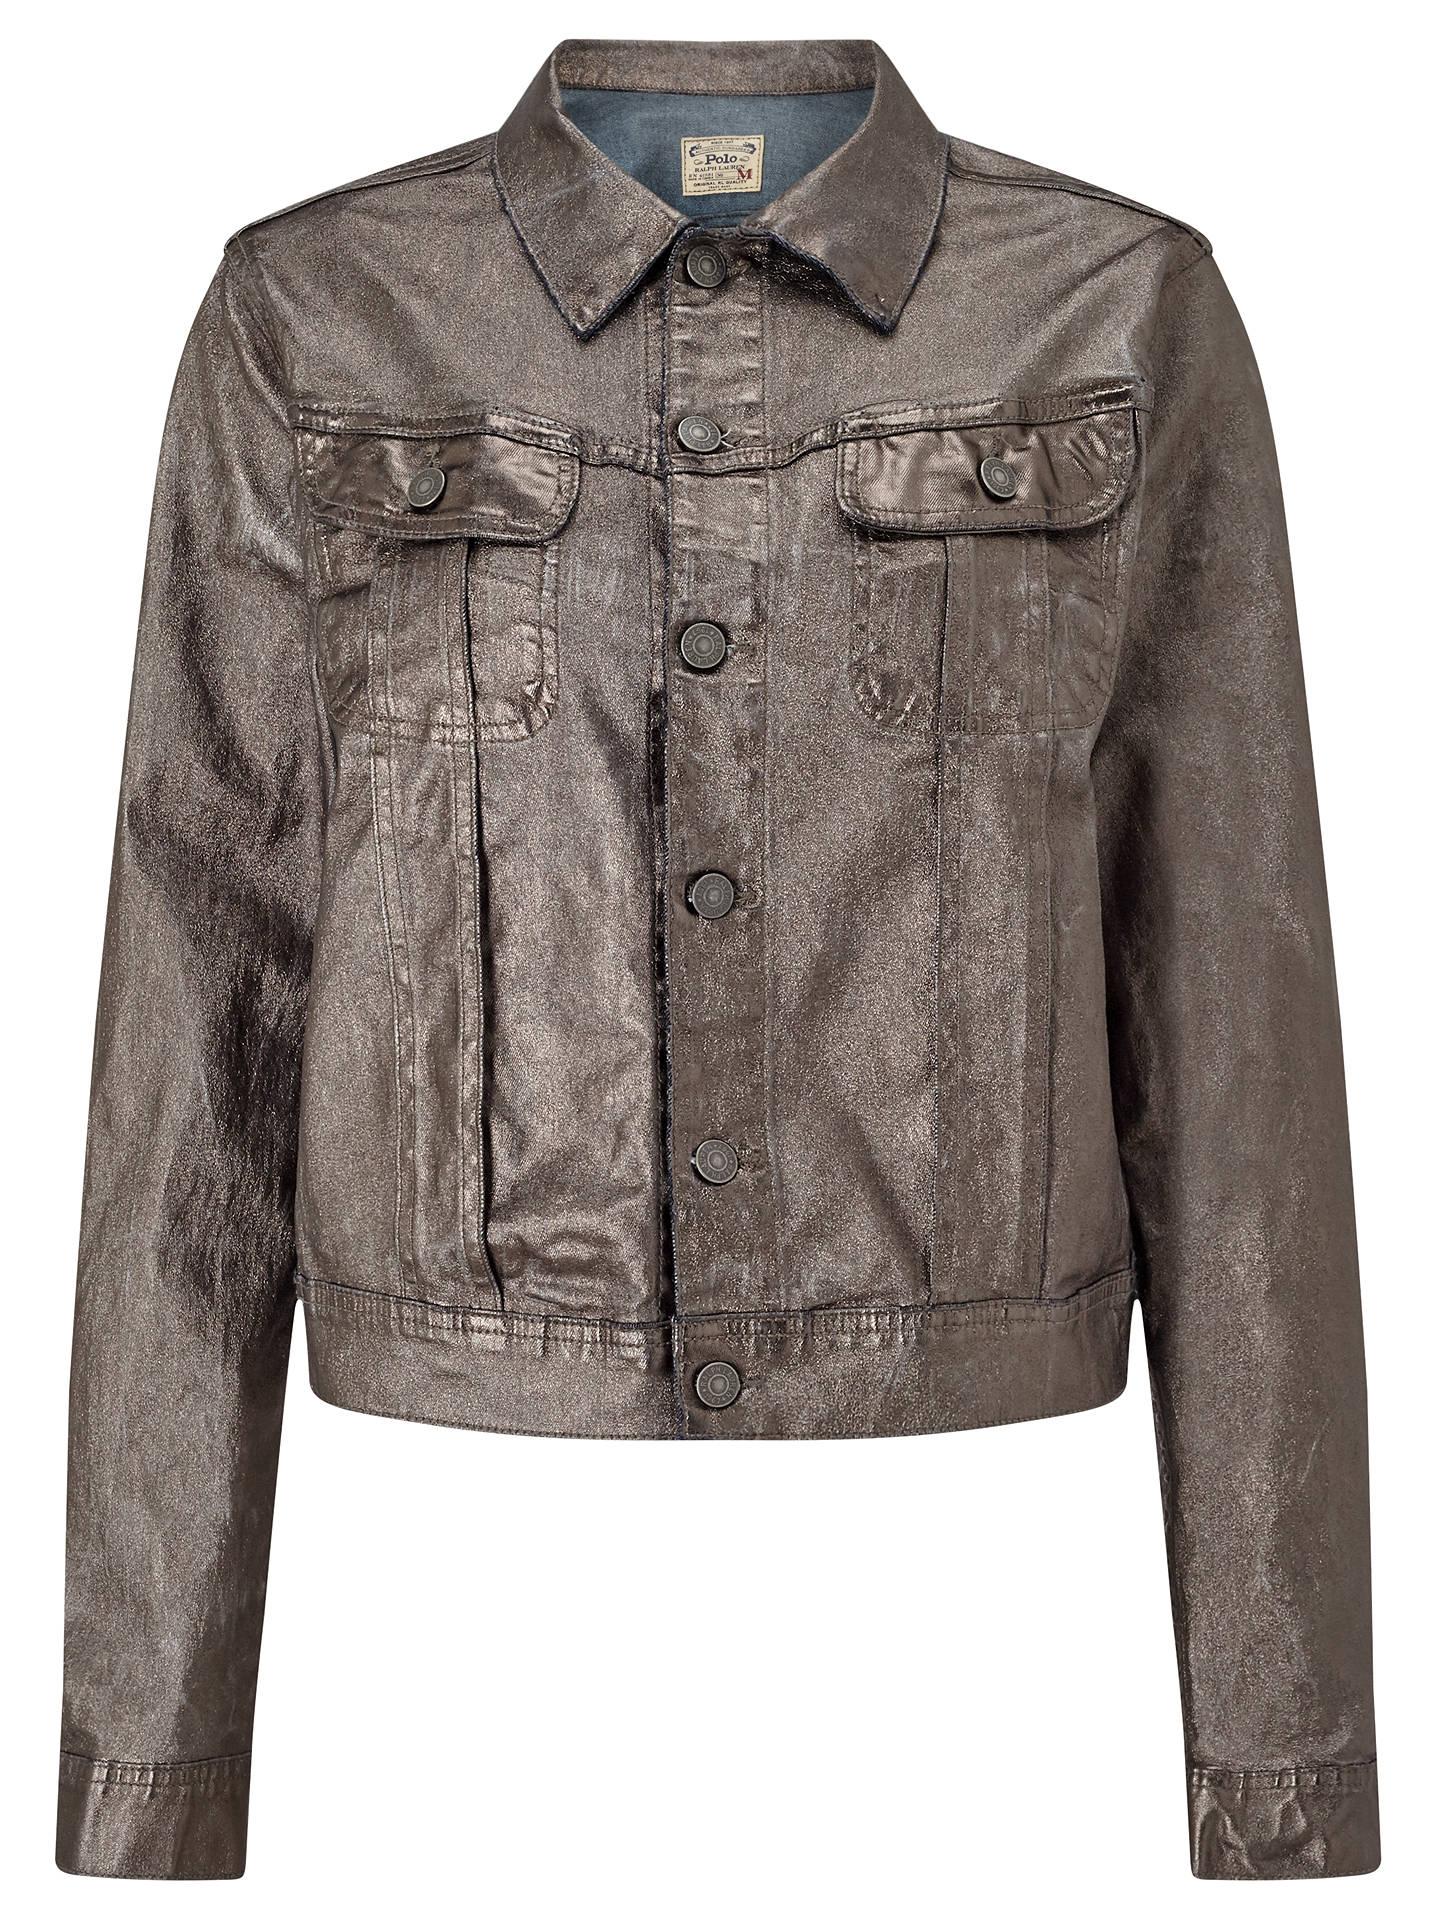 8d79e398c534b1 Buy Polo Ralph Lauren Denim Trucker Jacket